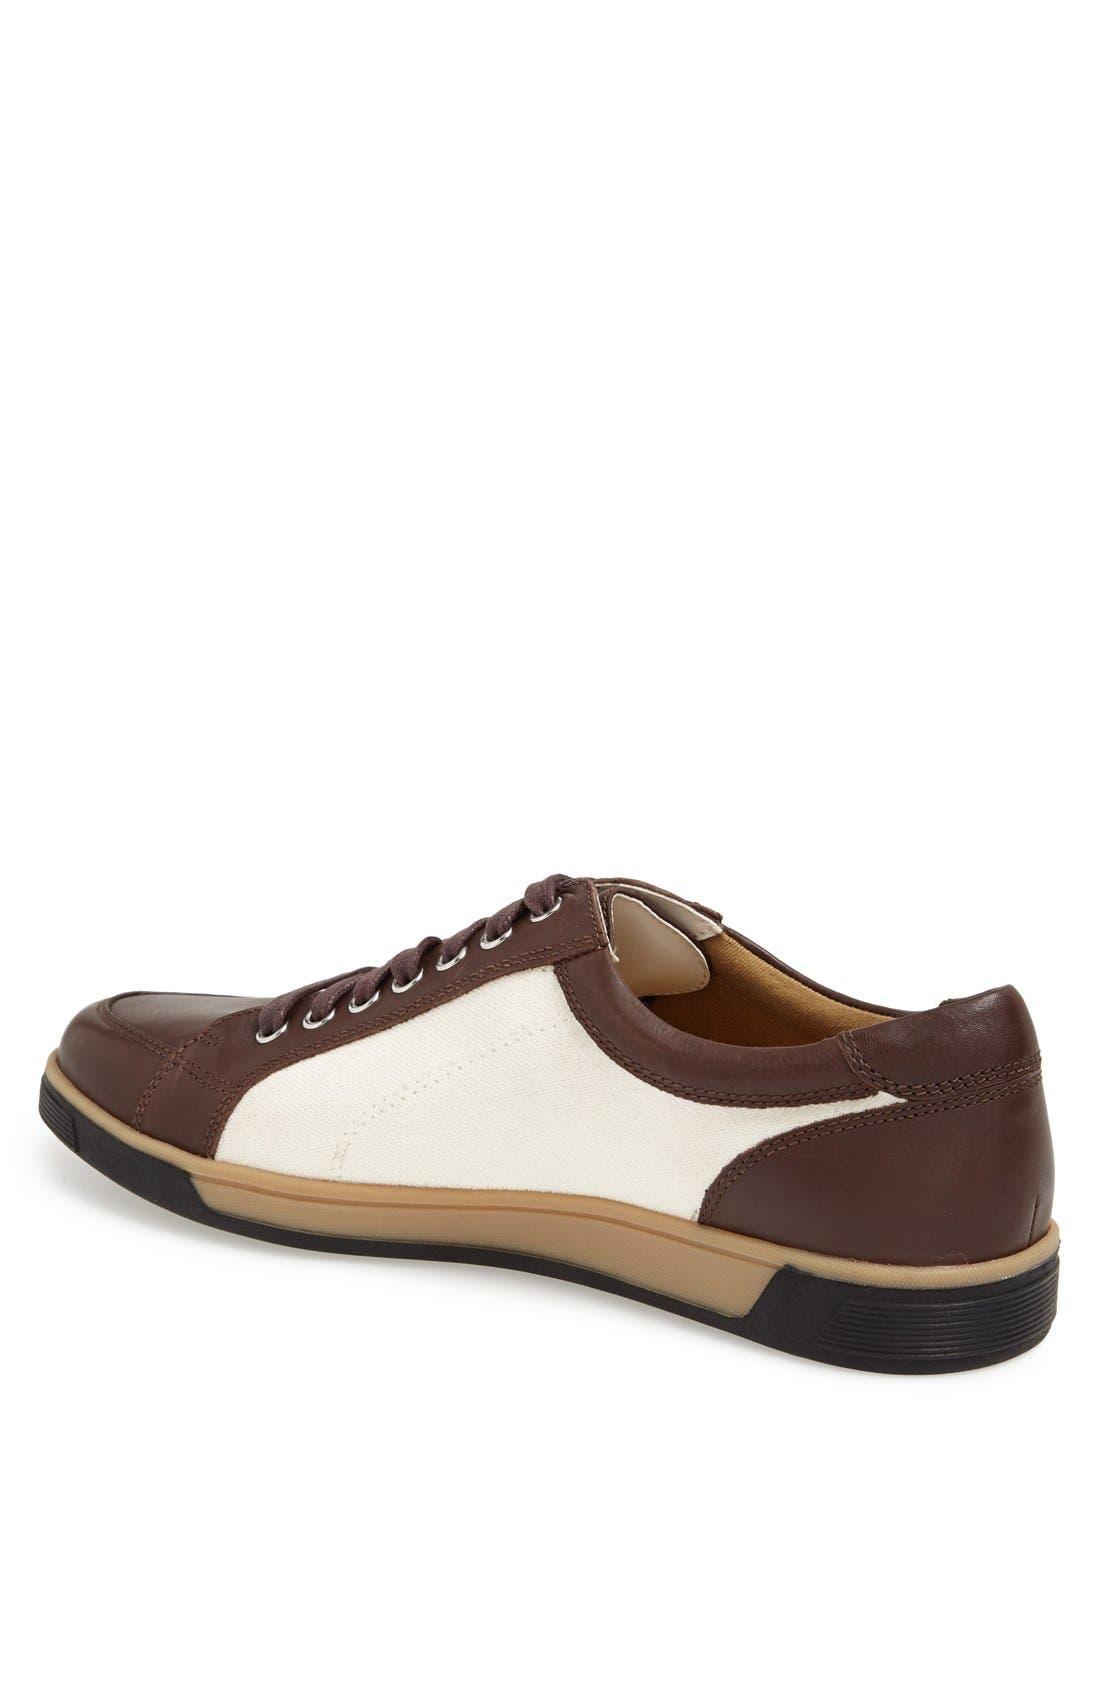 'Vartan Sport Oxford' Sneaker,                             Alternate thumbnail 39, color,